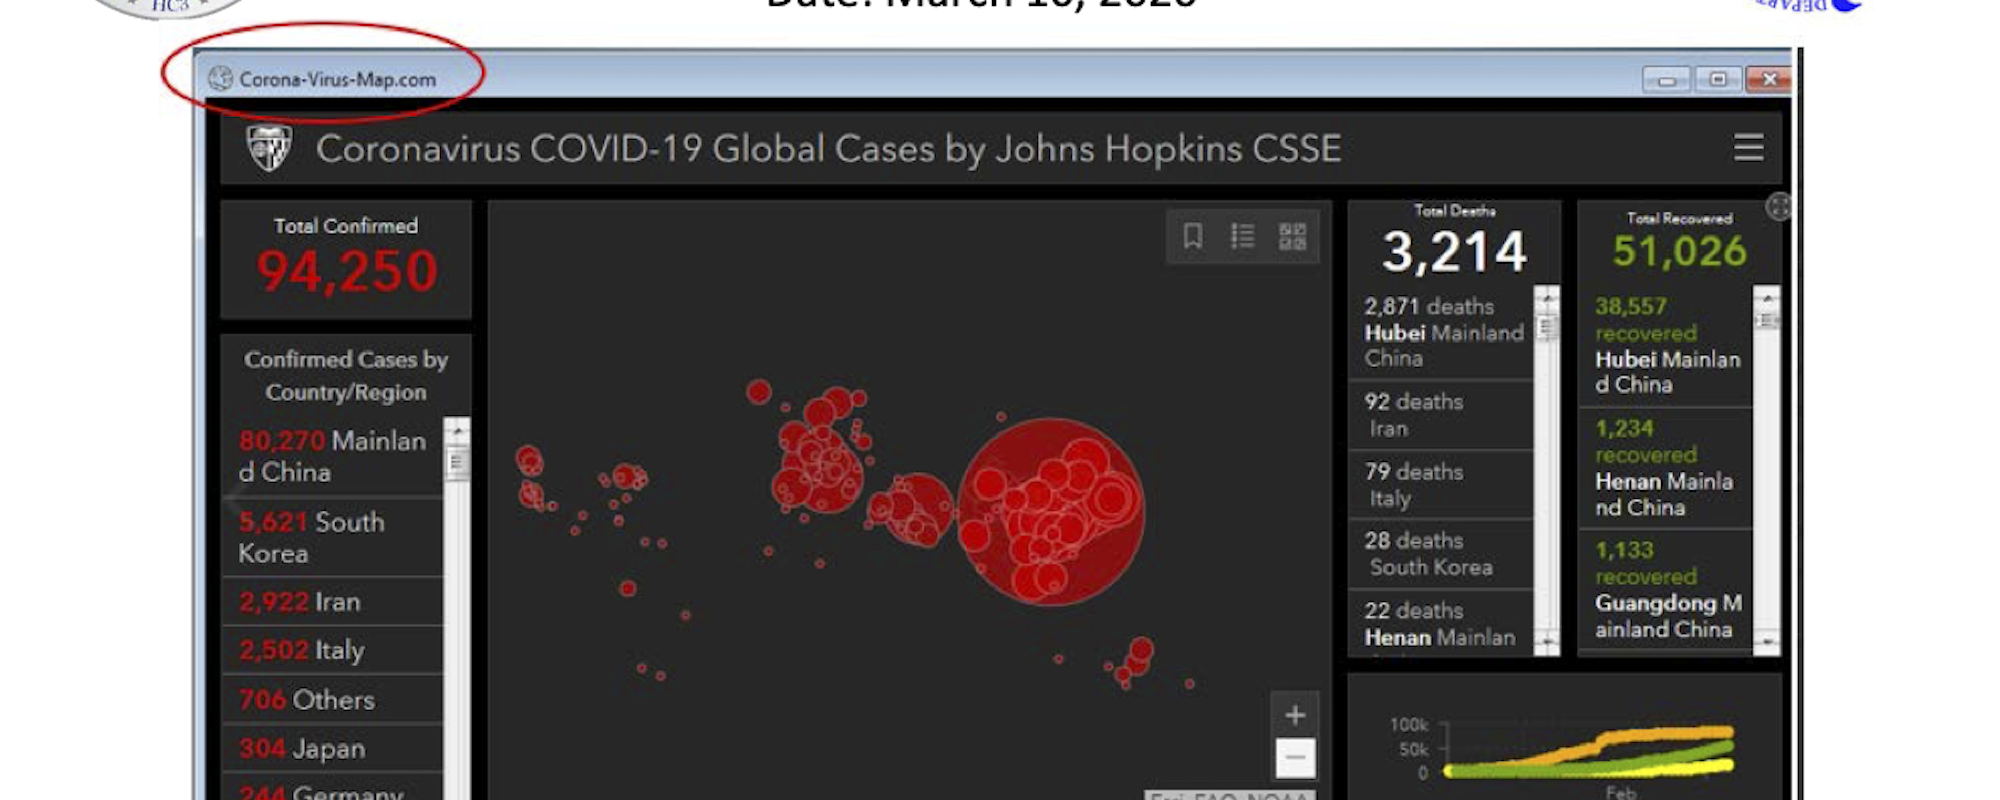 "Screenshot of the malicious website ""Corona-Virus-Map[dot]com pretending to be a legitimate COVID-19 tracker."